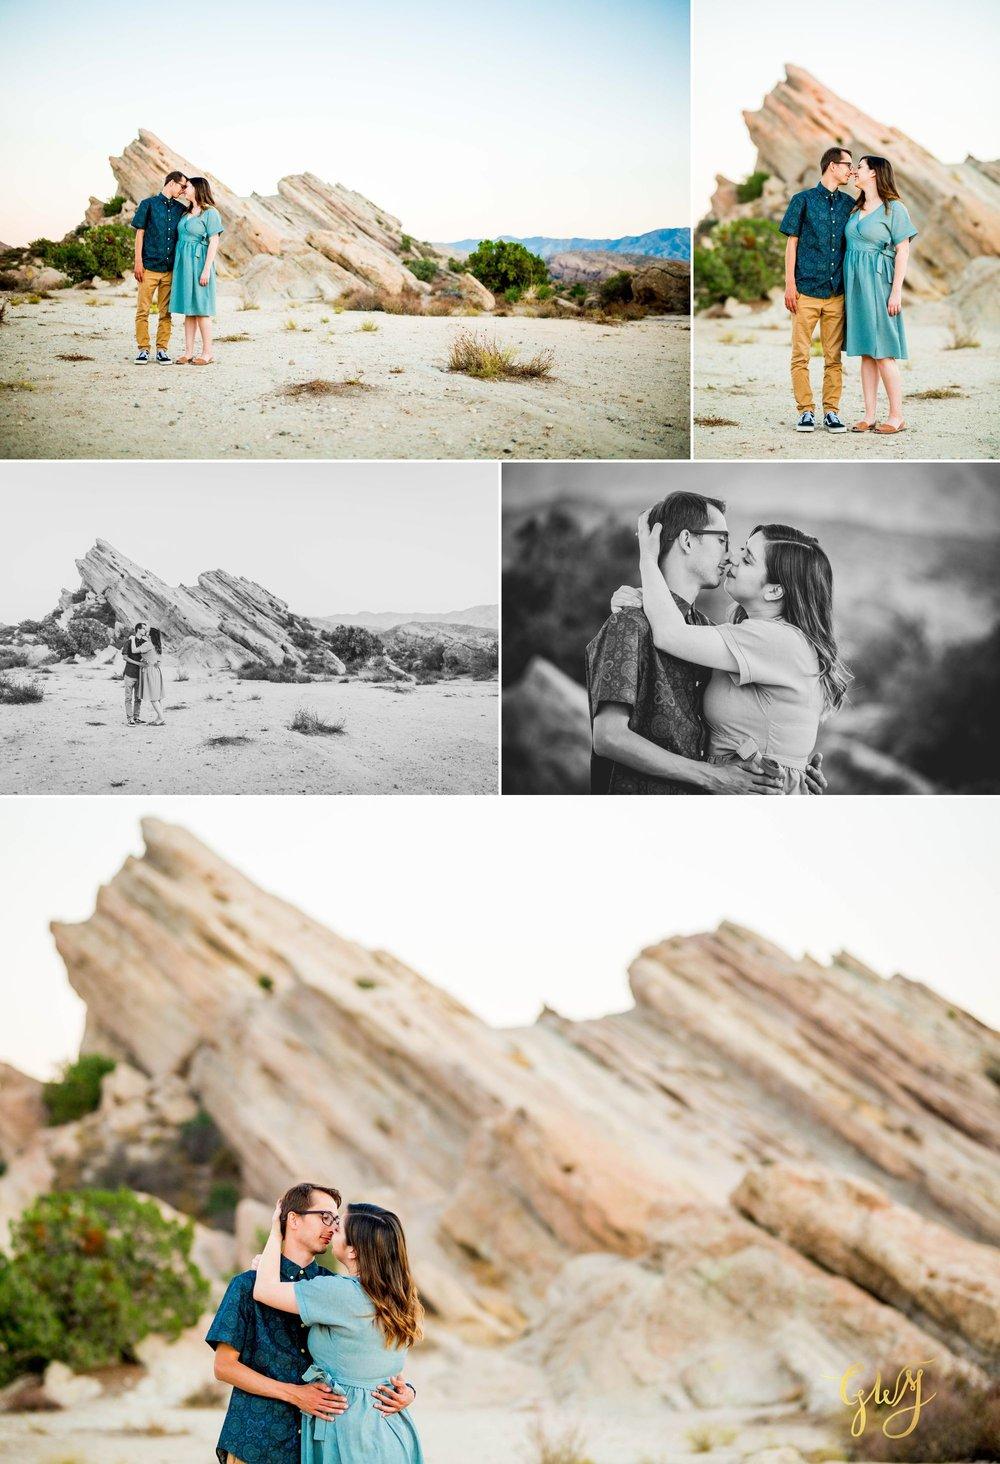 KJ + Maddie Vasquez Rocks Adventurous Hiking Outdoors Engagement Session by Glass Woods Media 14.jpg